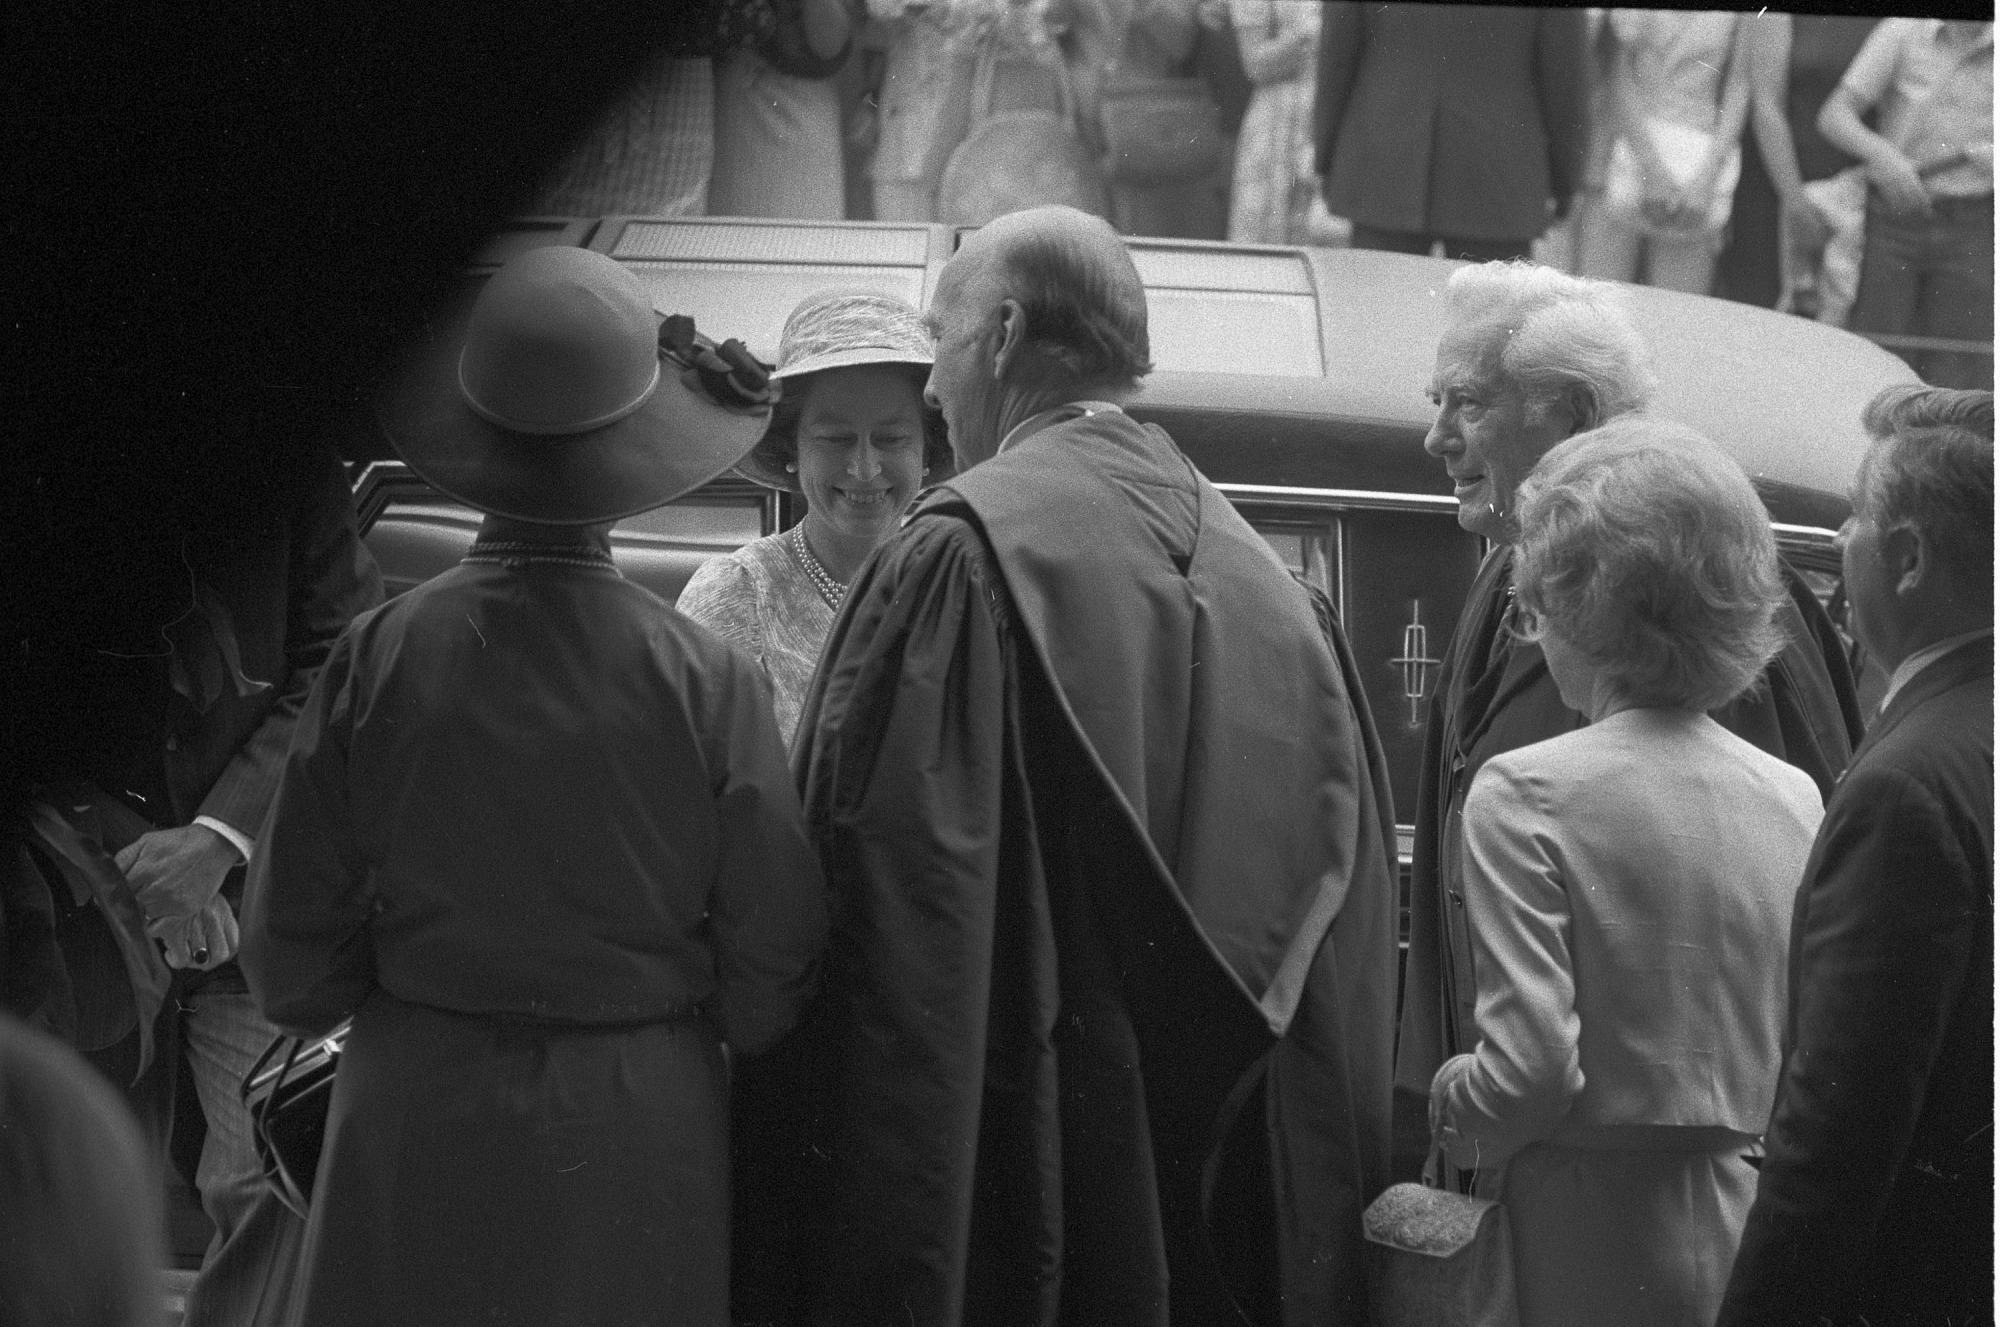 Jul 8 Queen Elizabeth Visits the Smithsonian